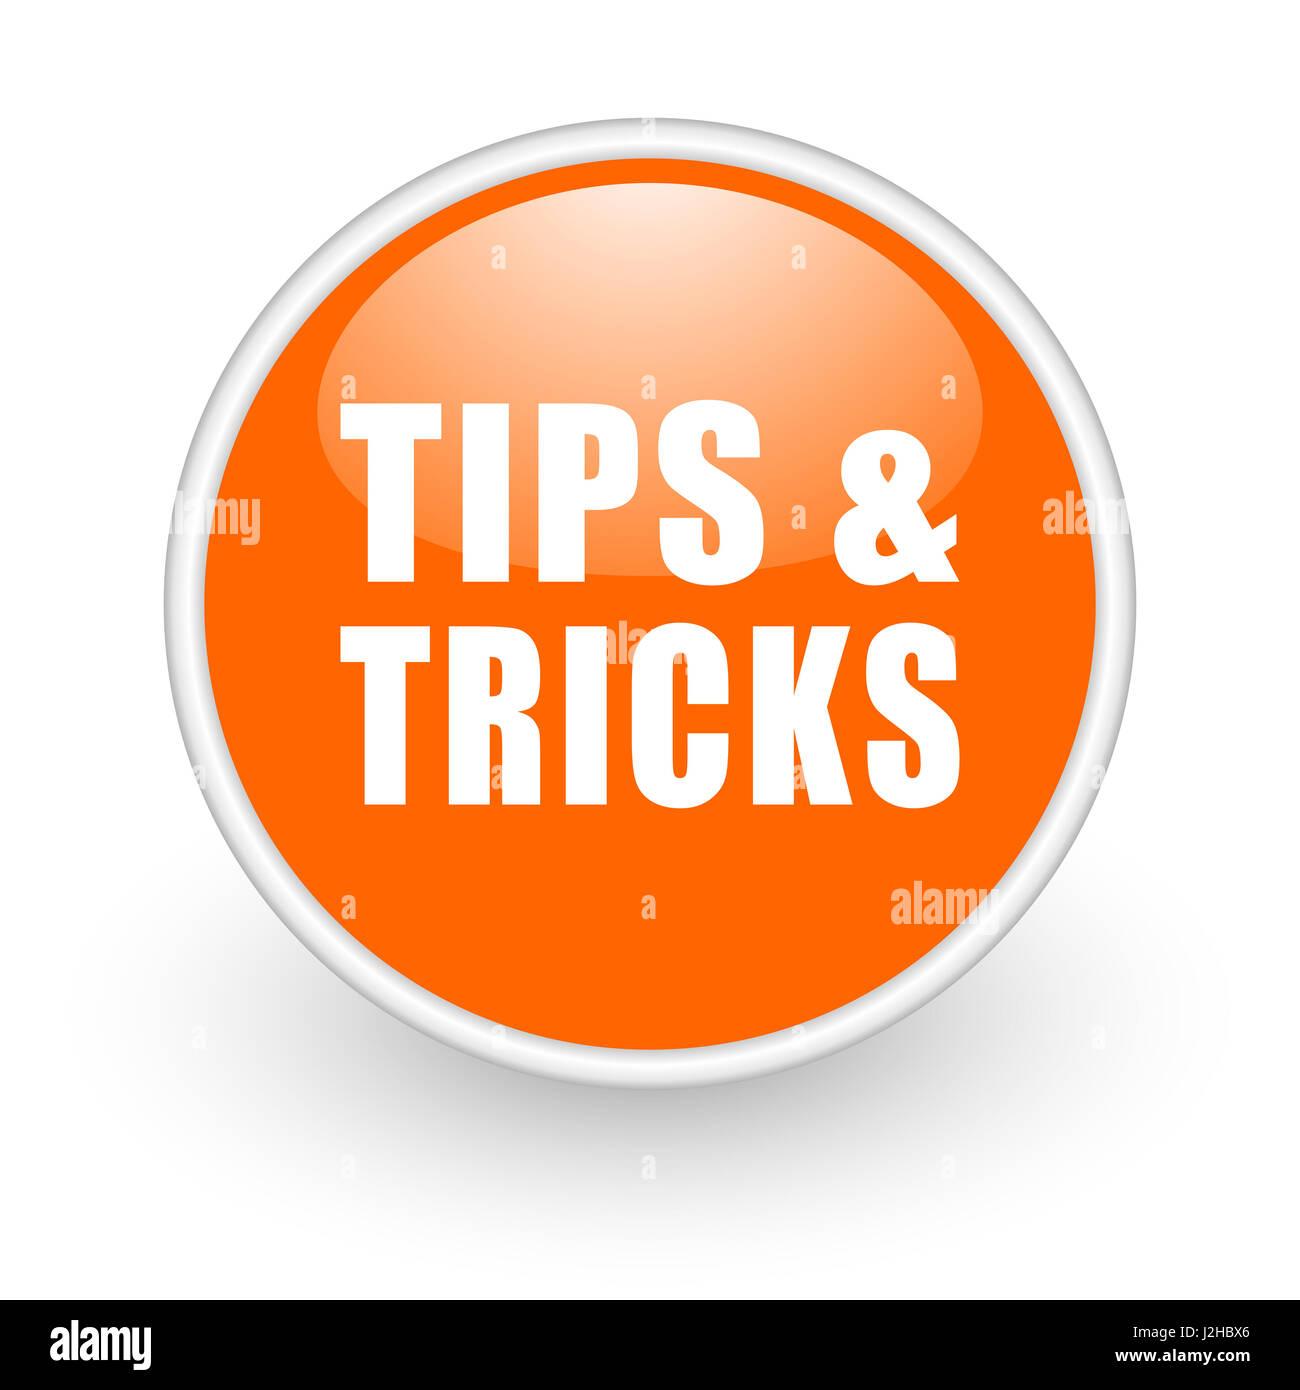 Designer Tips And Tricks For: Tips Tricks Icon Stock Photos & Tips Tricks Icon Stock